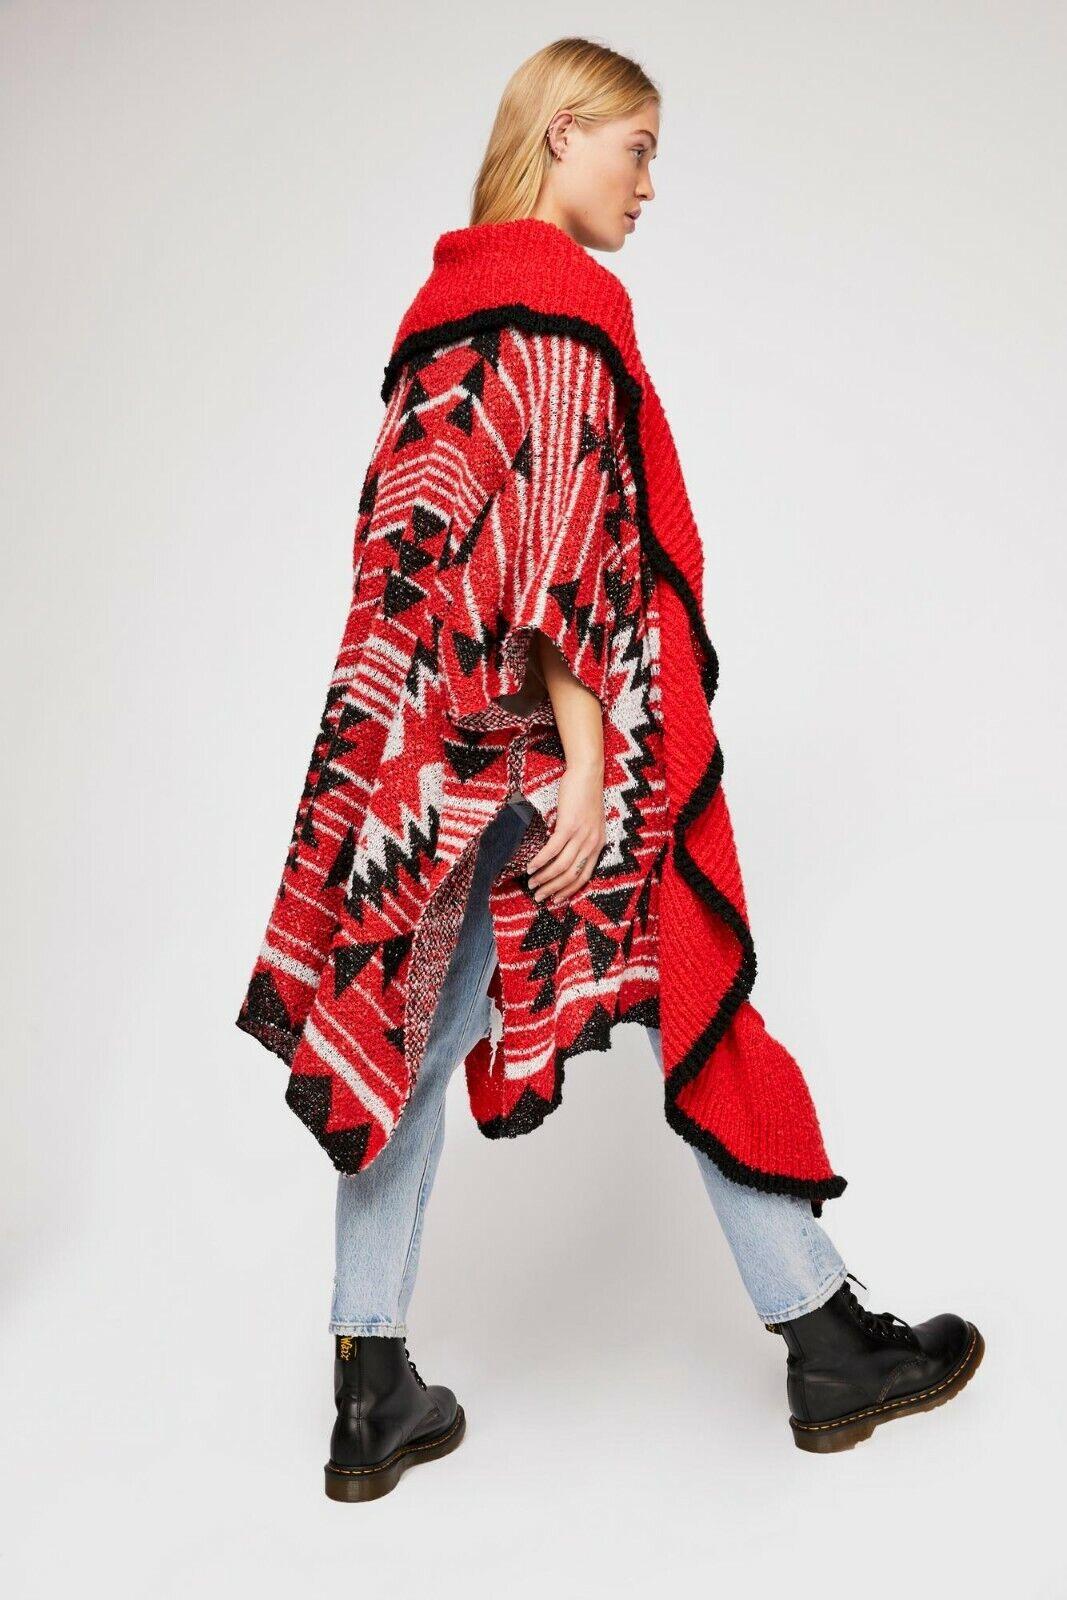 NewRare FREE PEOPLEAcadia Cozy KimonoRed ComboOne SizeOversize Sweater Coat